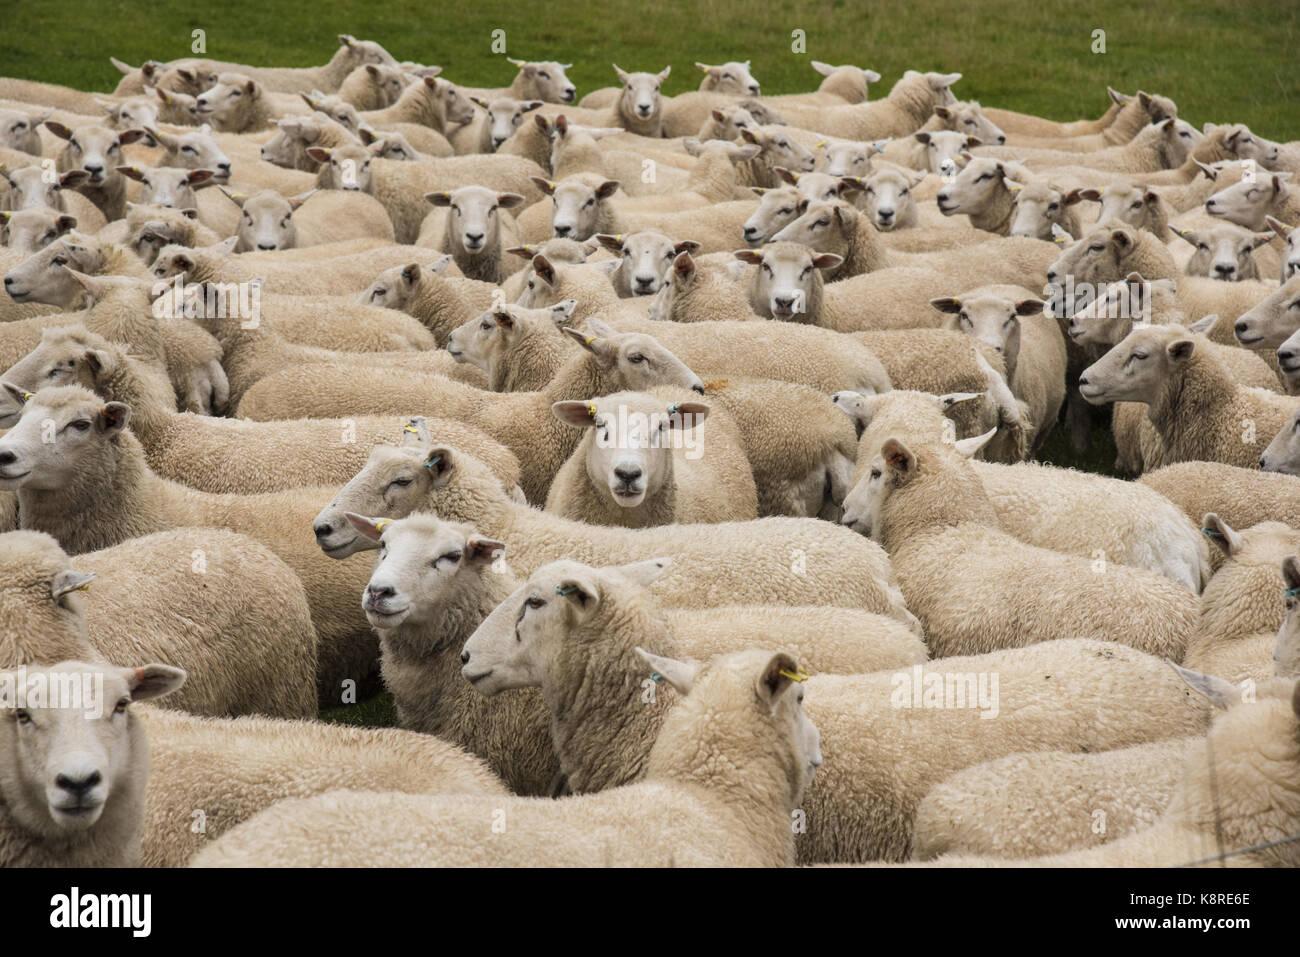 Highlander ewes, York, Yorkshire. - Stock Image